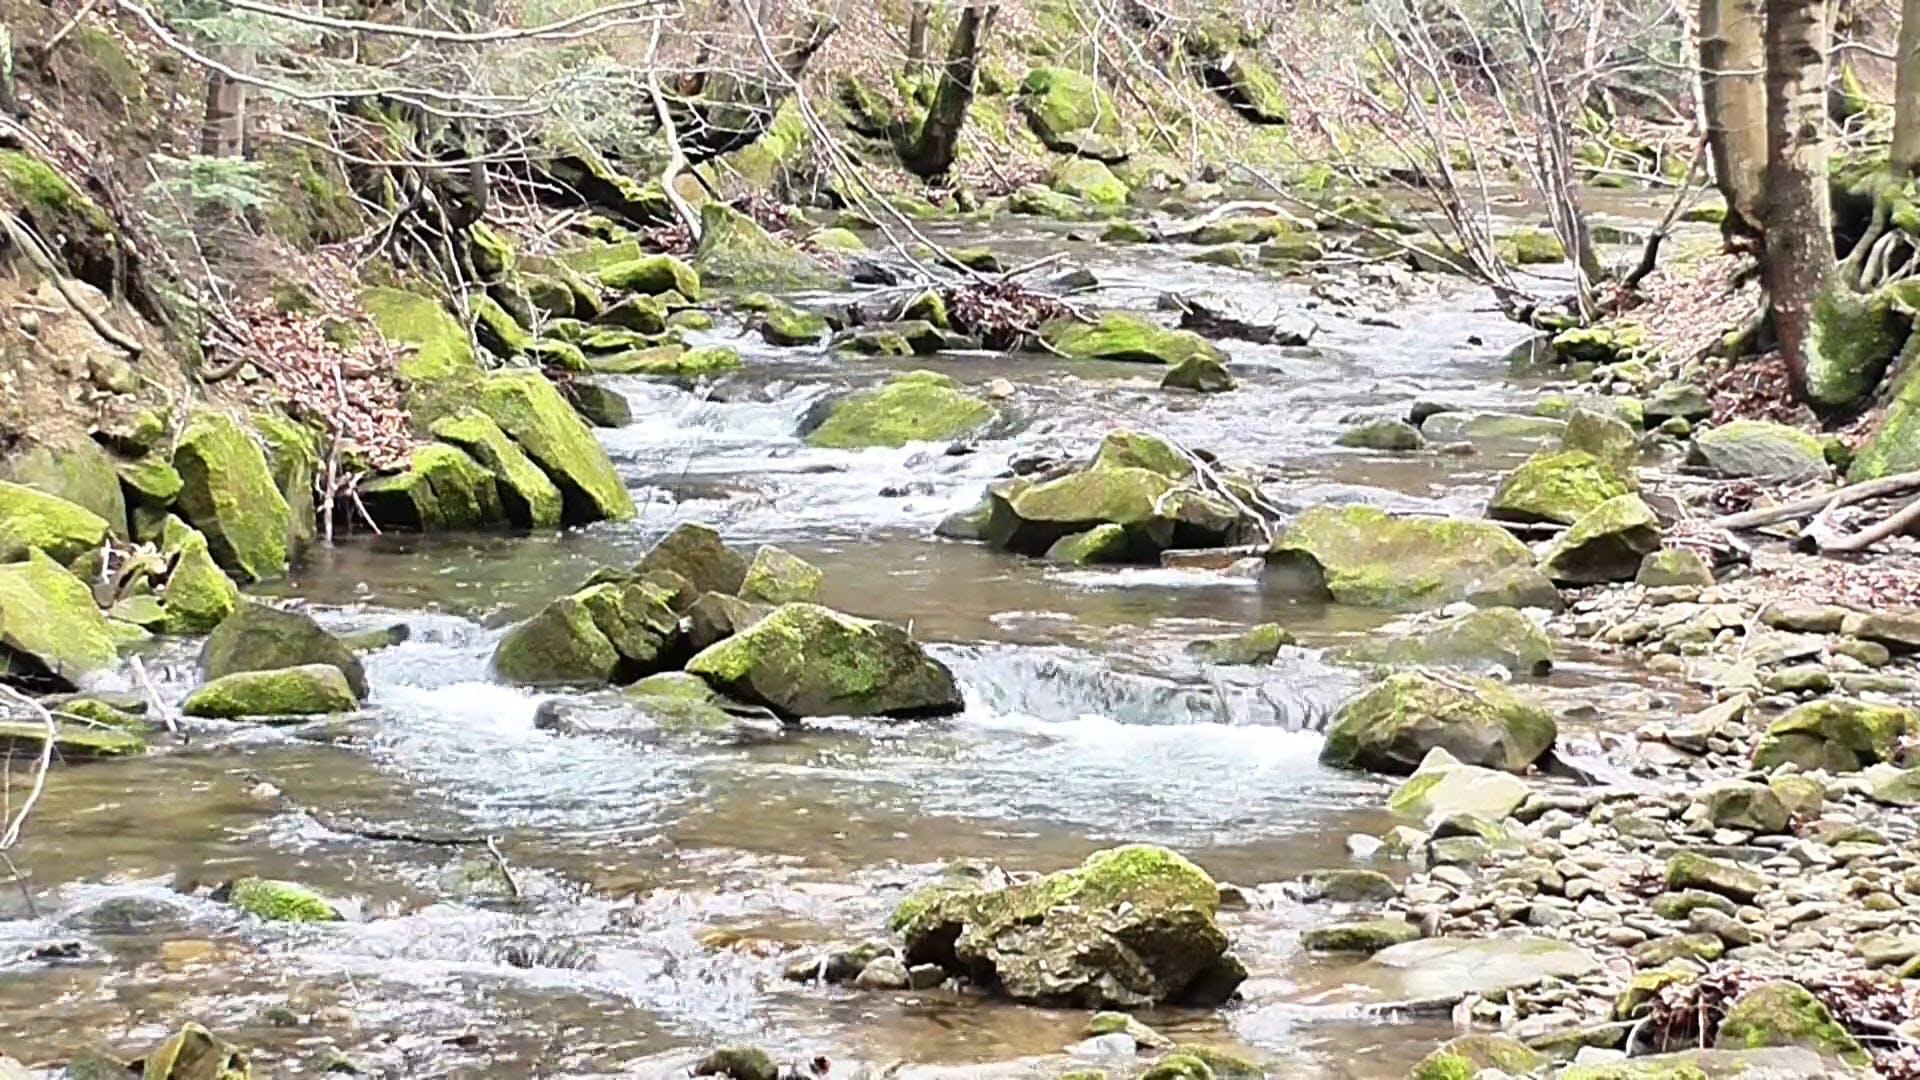 A Flowing Stream